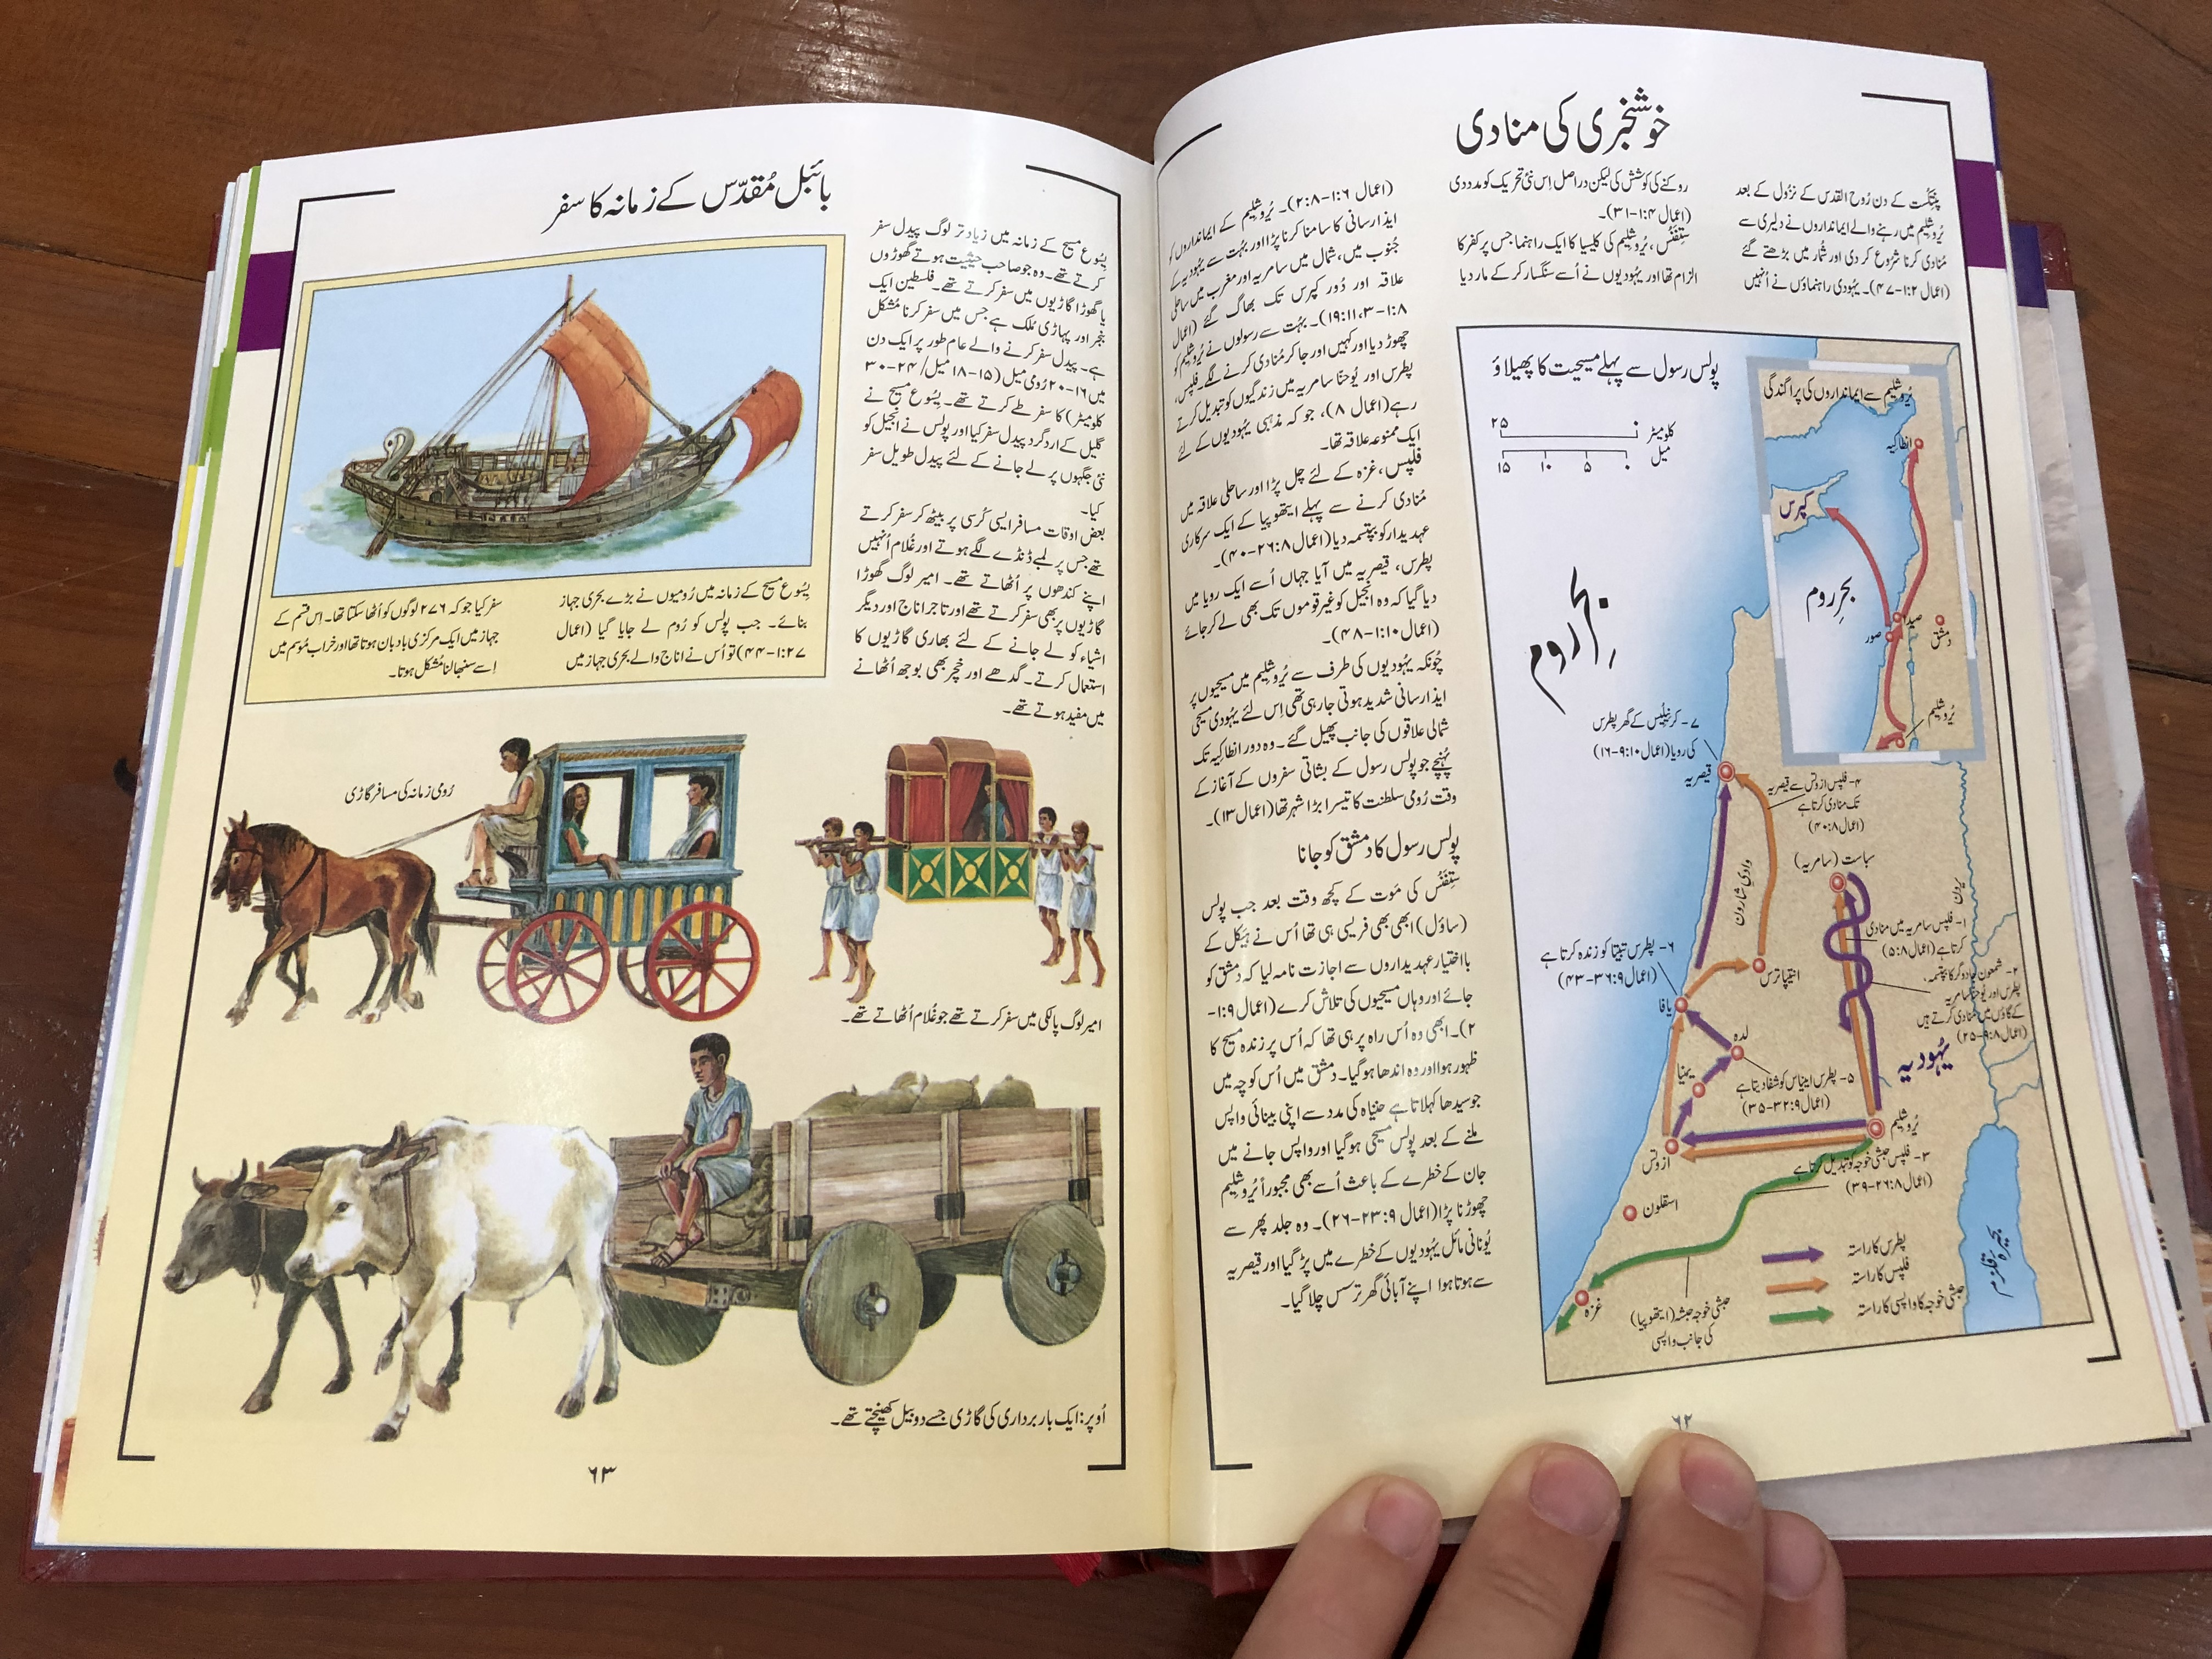 the-bible-encyclopedia-in-urdu-language-translated-from-12-english-titles-pakistan-bible-society-2018-hardcover-6-.jpg